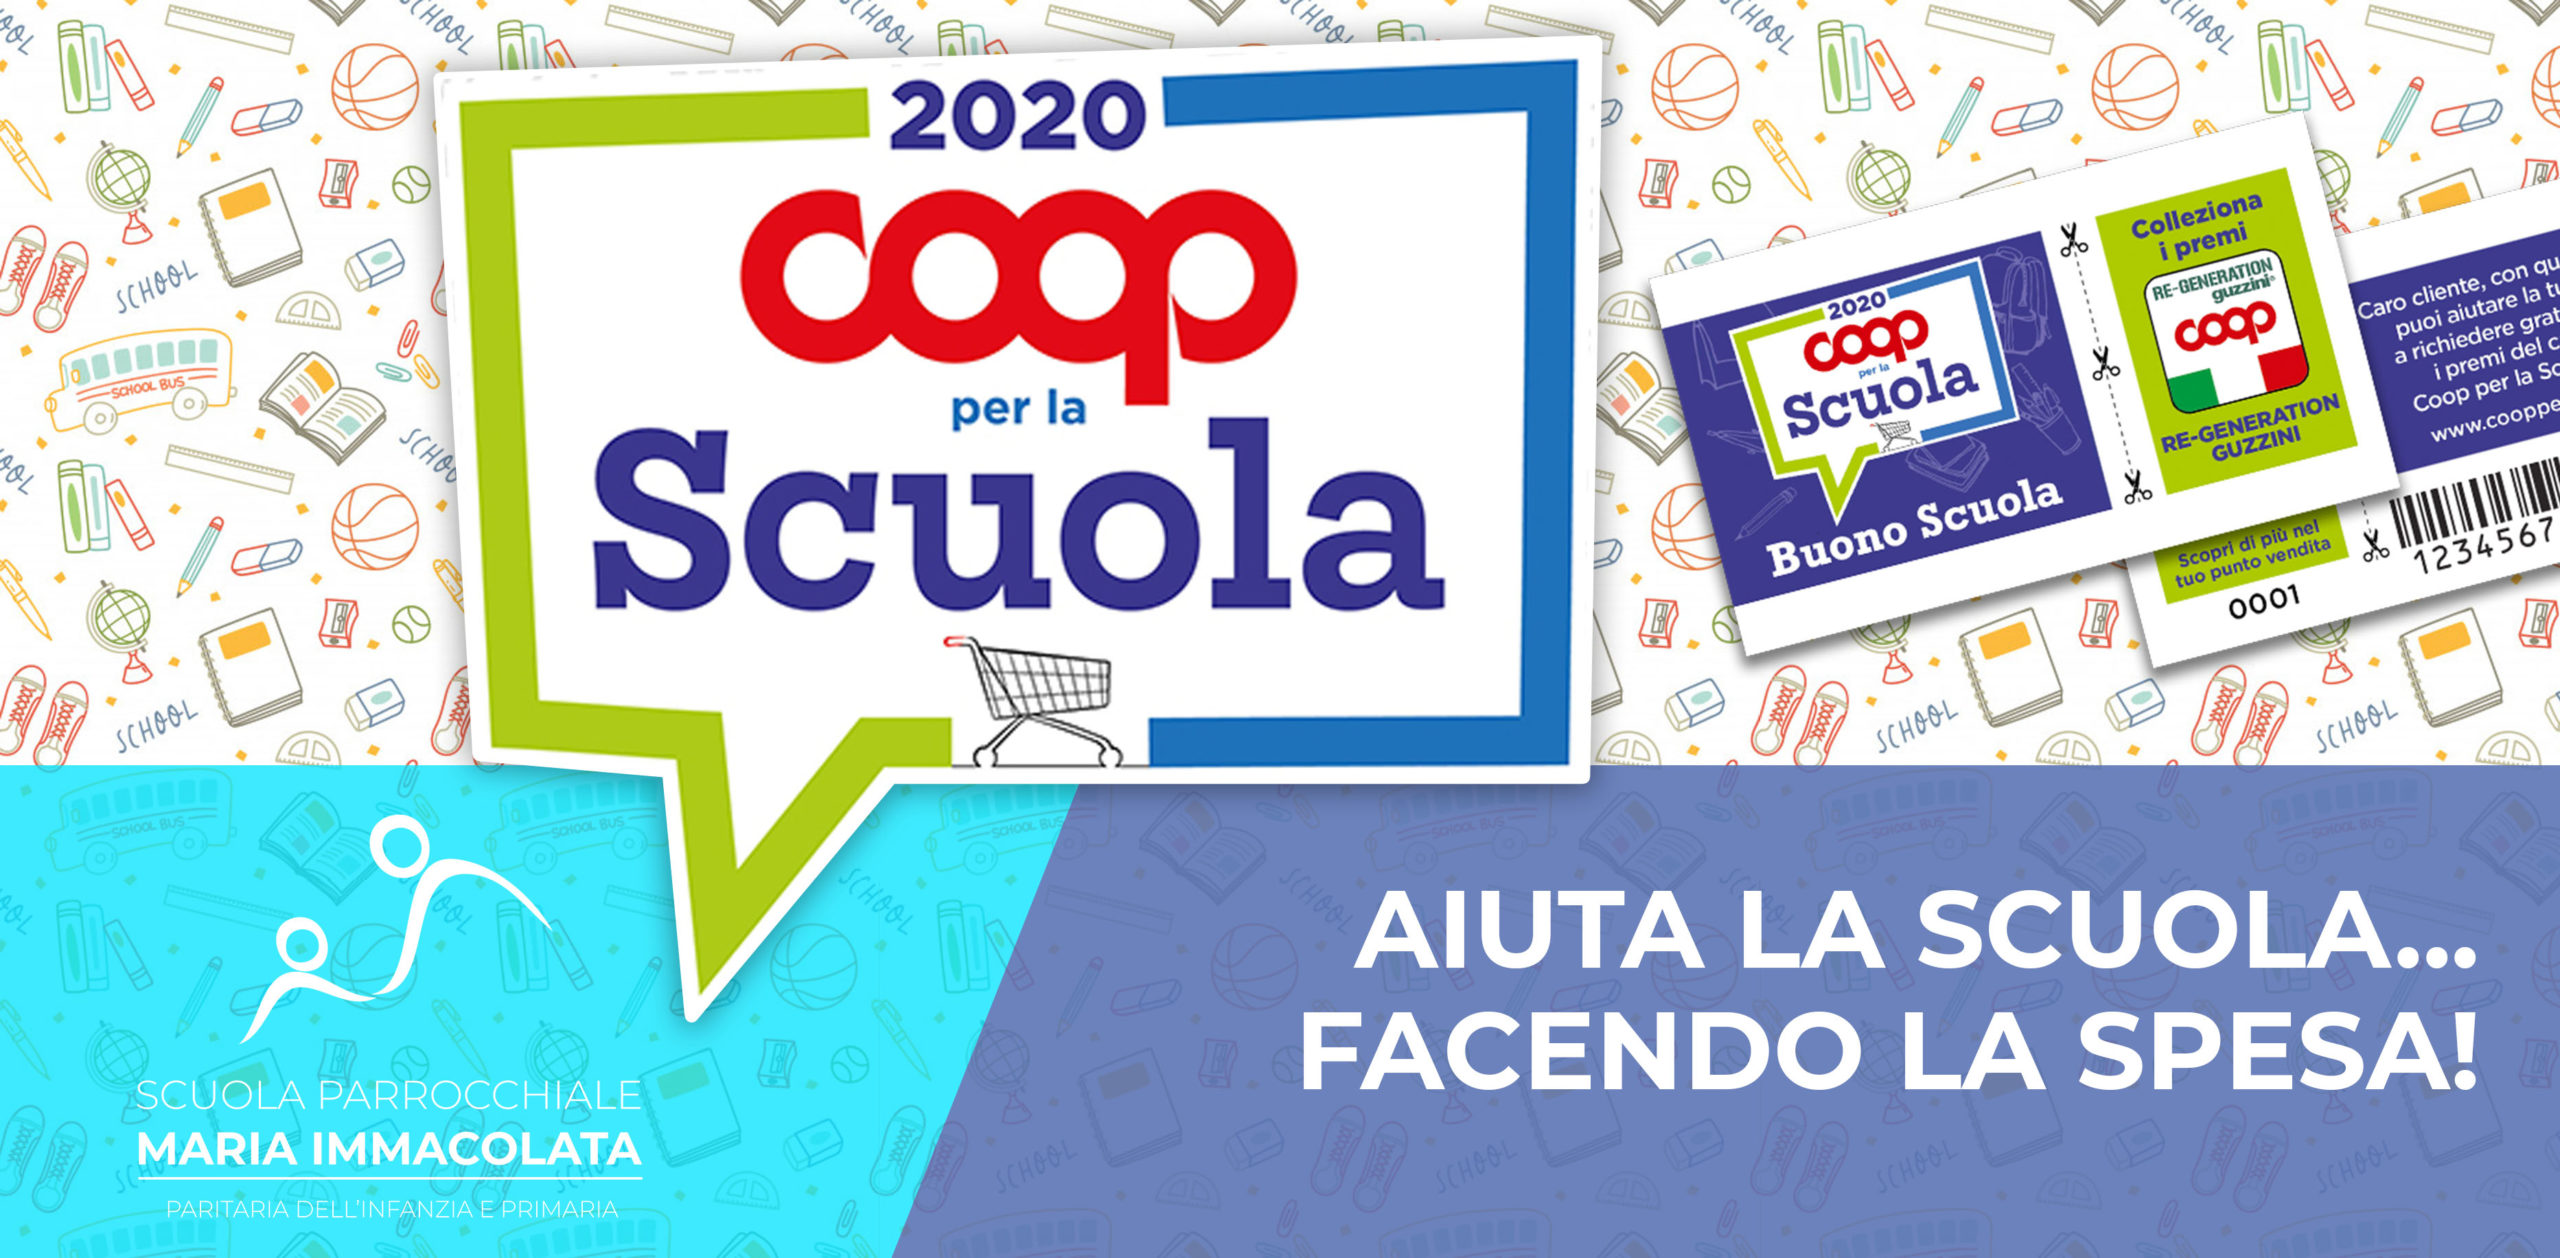 Iniziativa Coop per la Scuola 2020